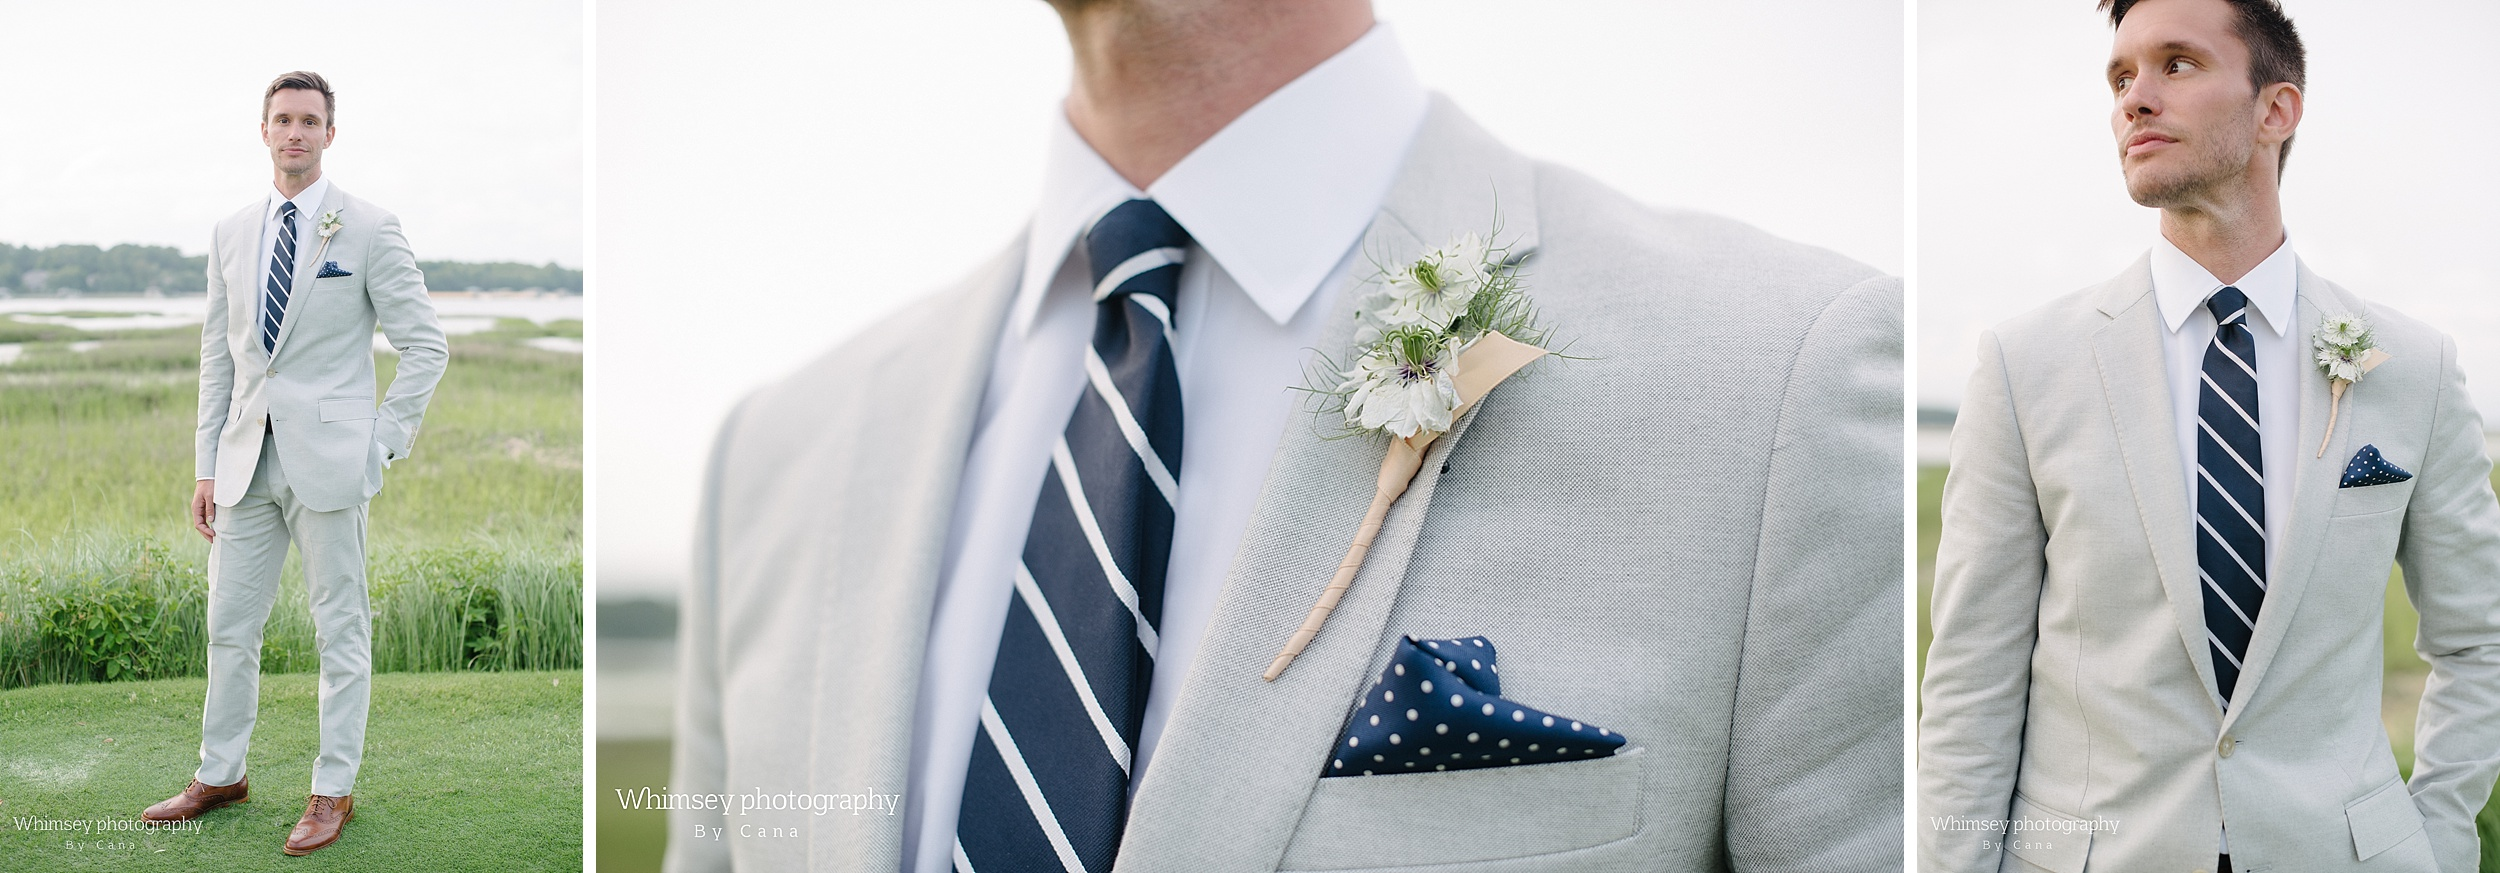 Whimsical Outdoor Hilton Head Wedding